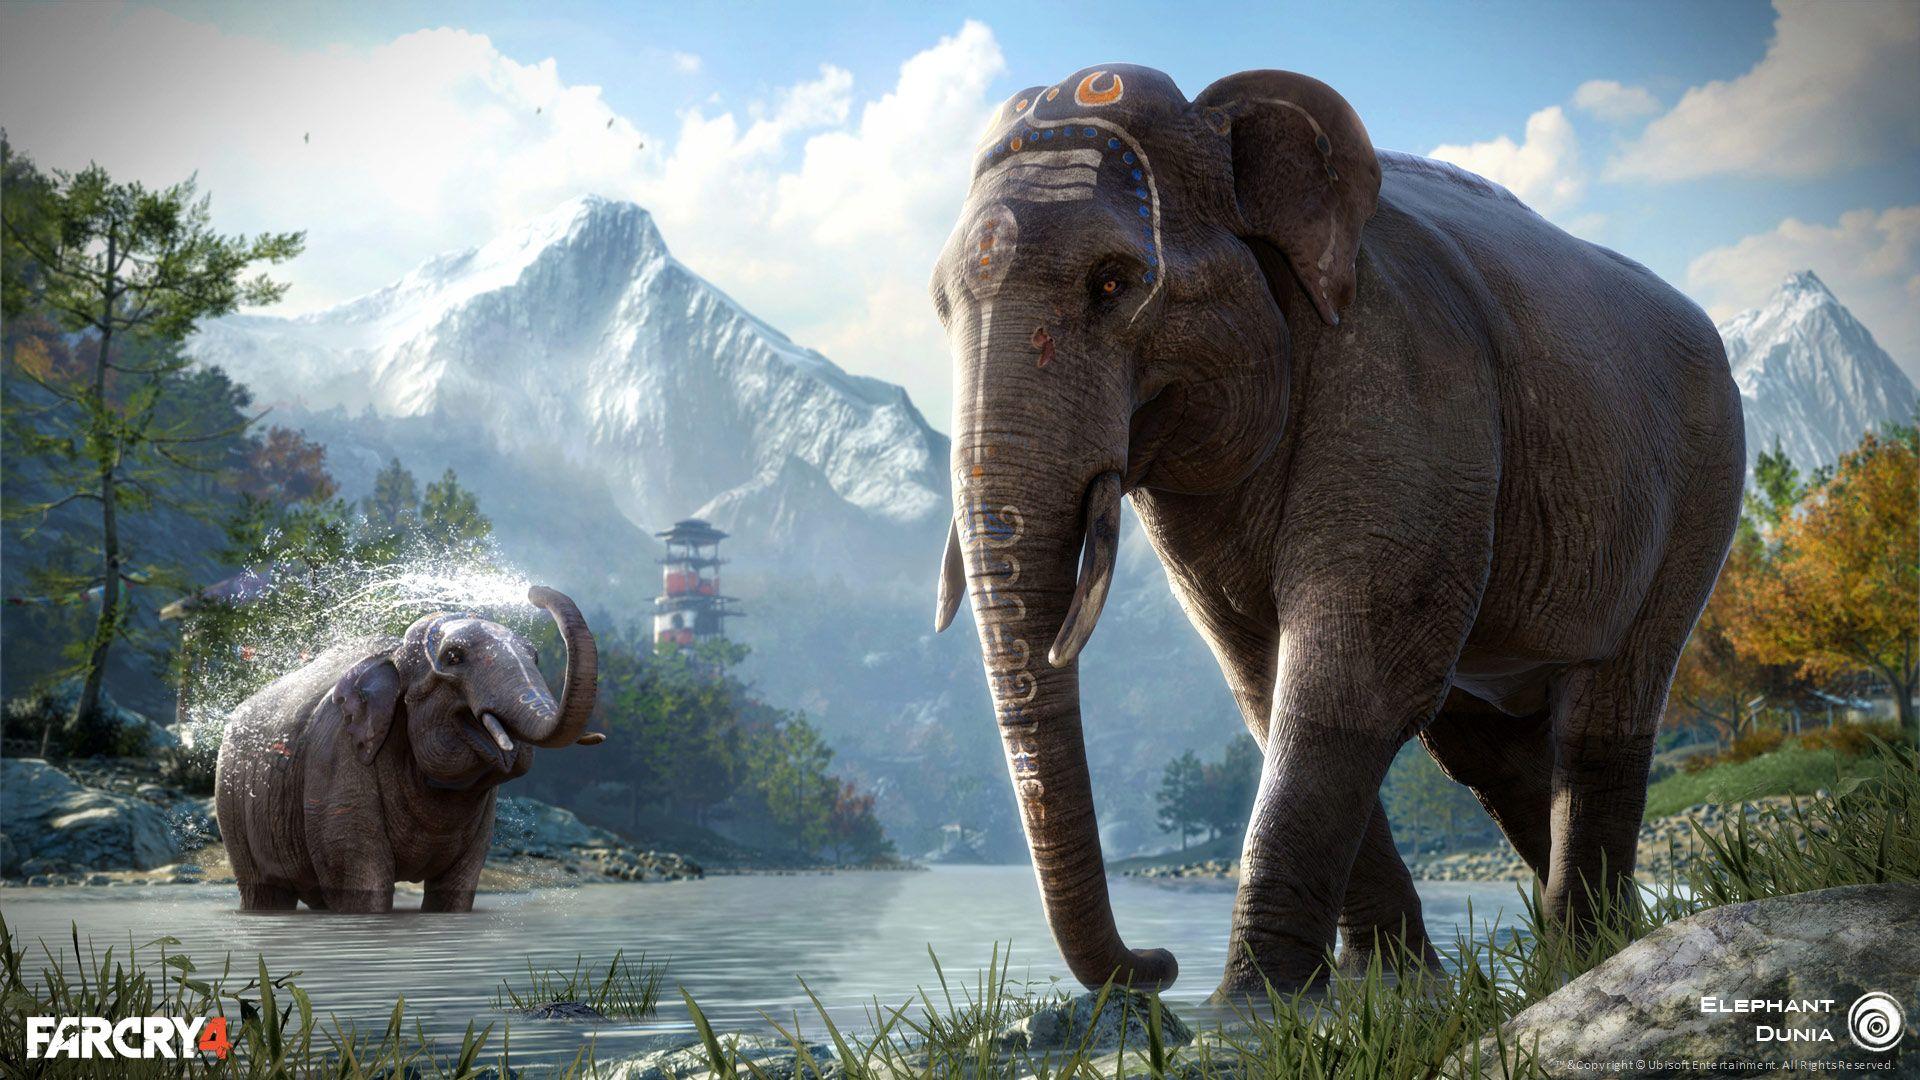 Far Cry 4 Wallpaper Elephant